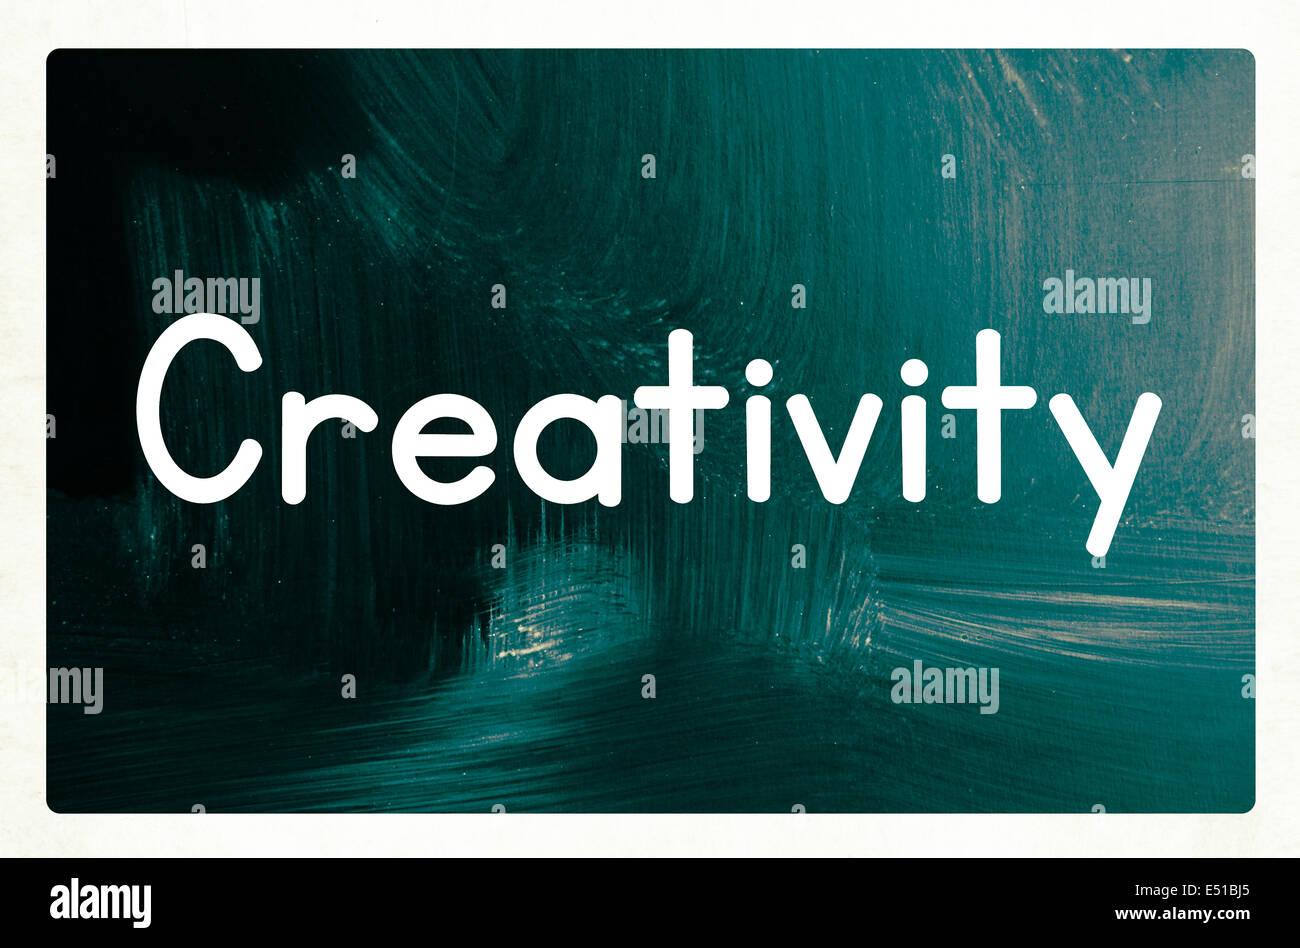 creativity concept - Stock Image